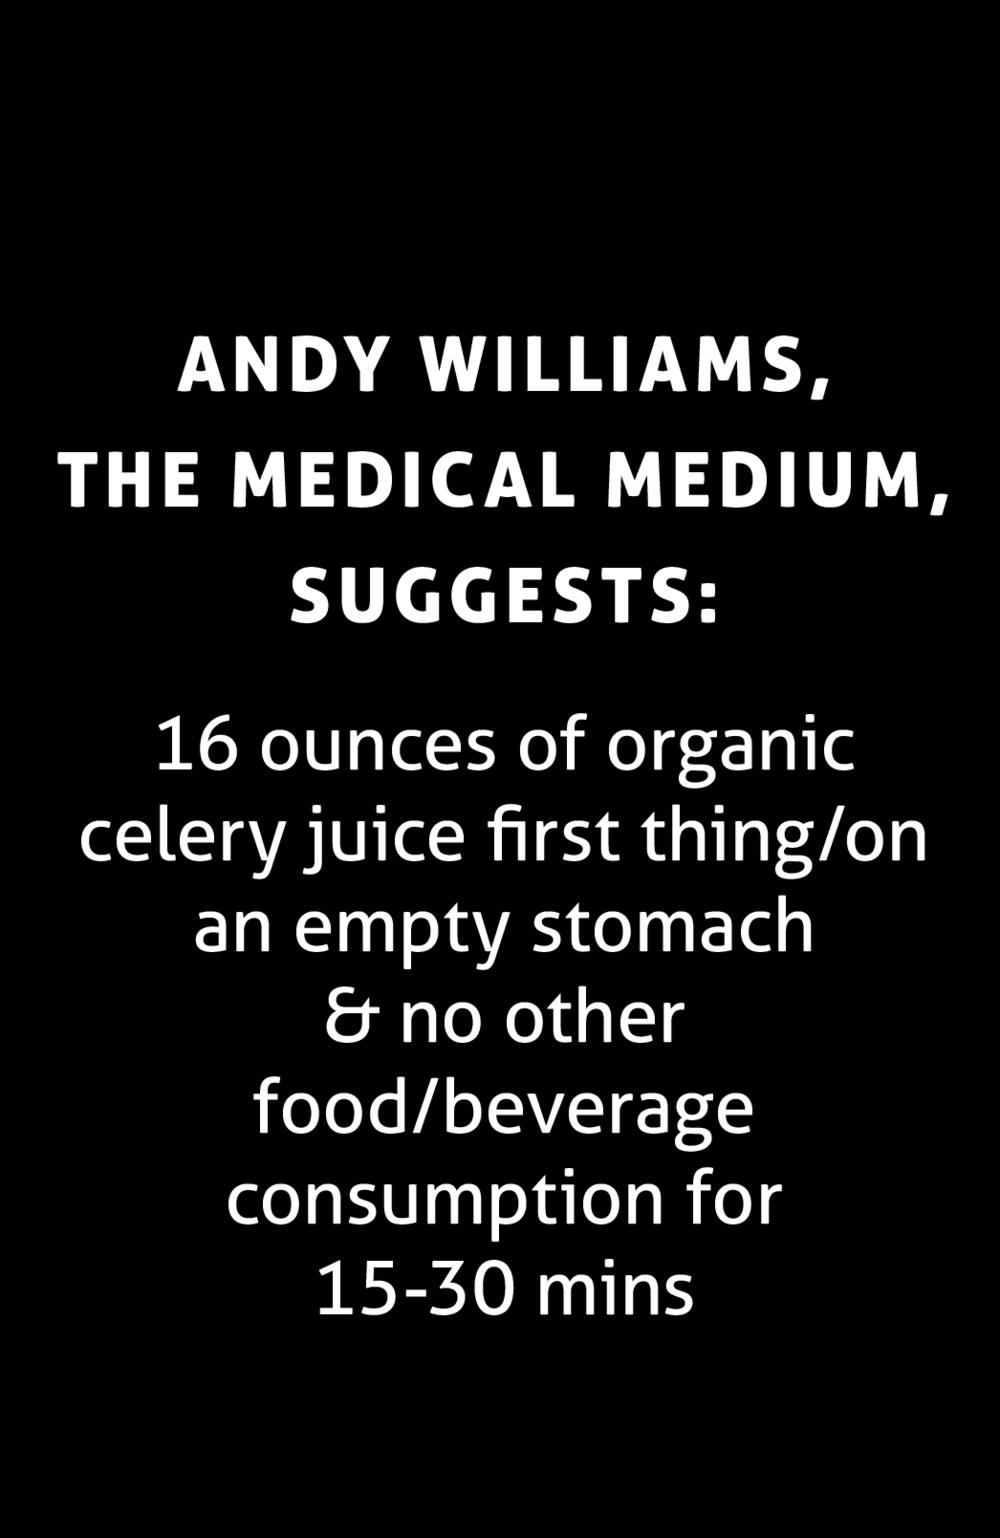 https://www.medicalmedium.com/blog/celery-juice-101